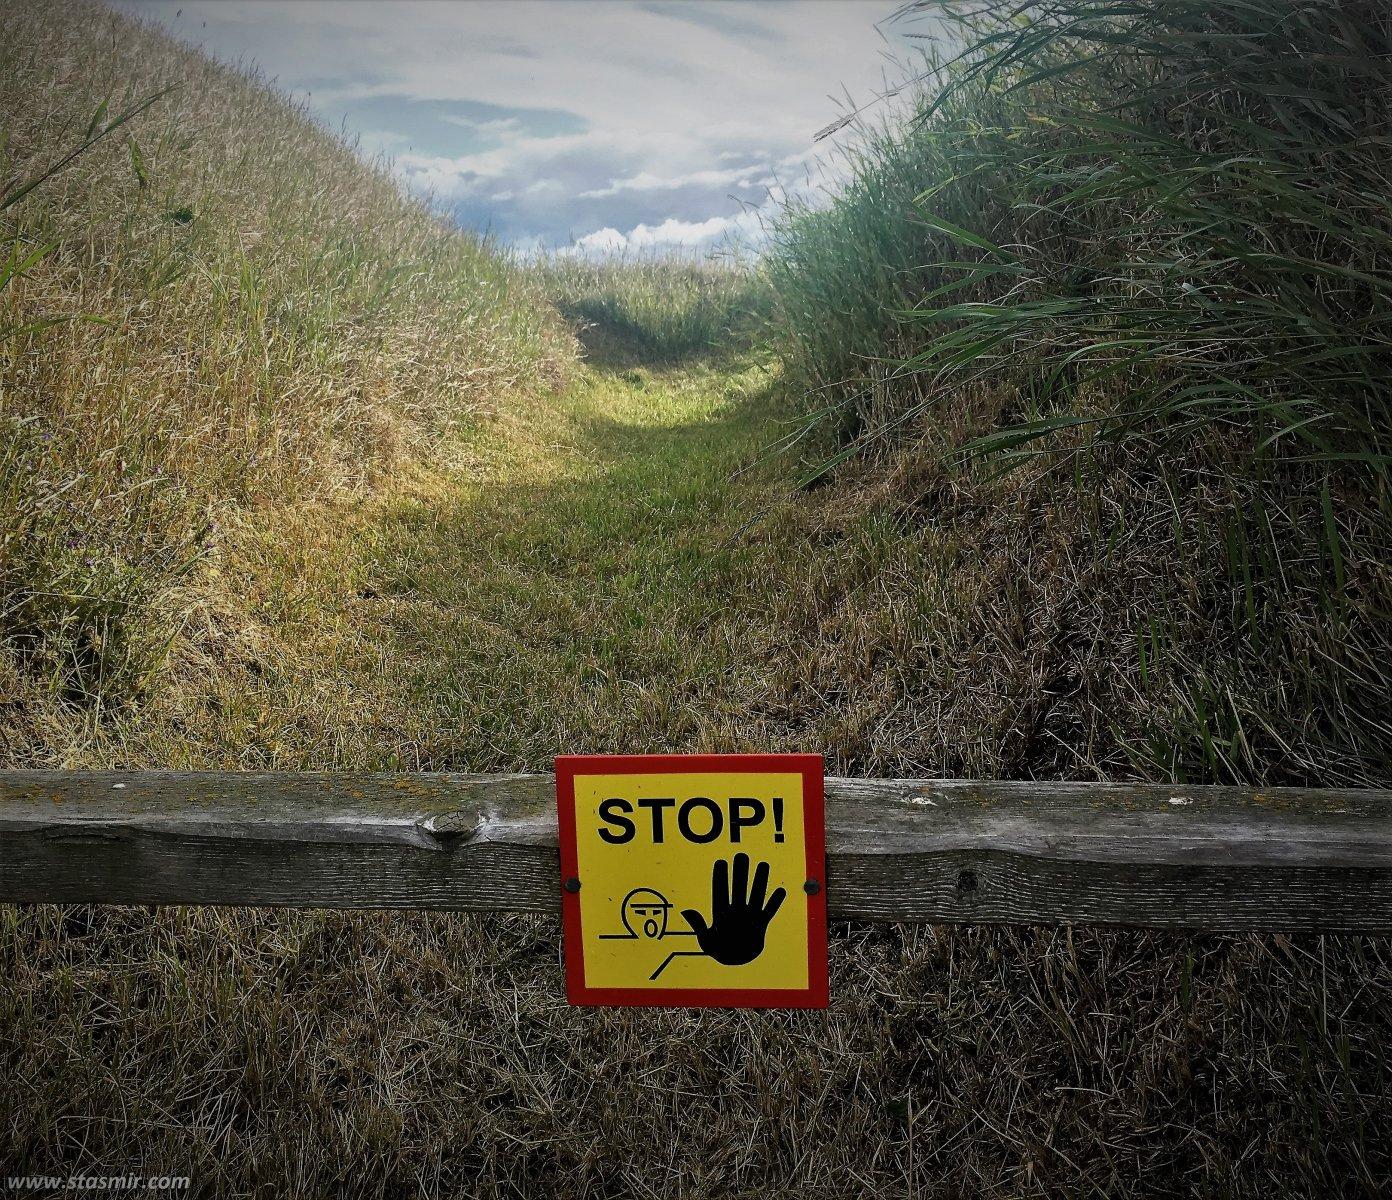 bannad - предложение, вернее, запрет, не ходит по траве, фото Стасмир, photo Stasmir